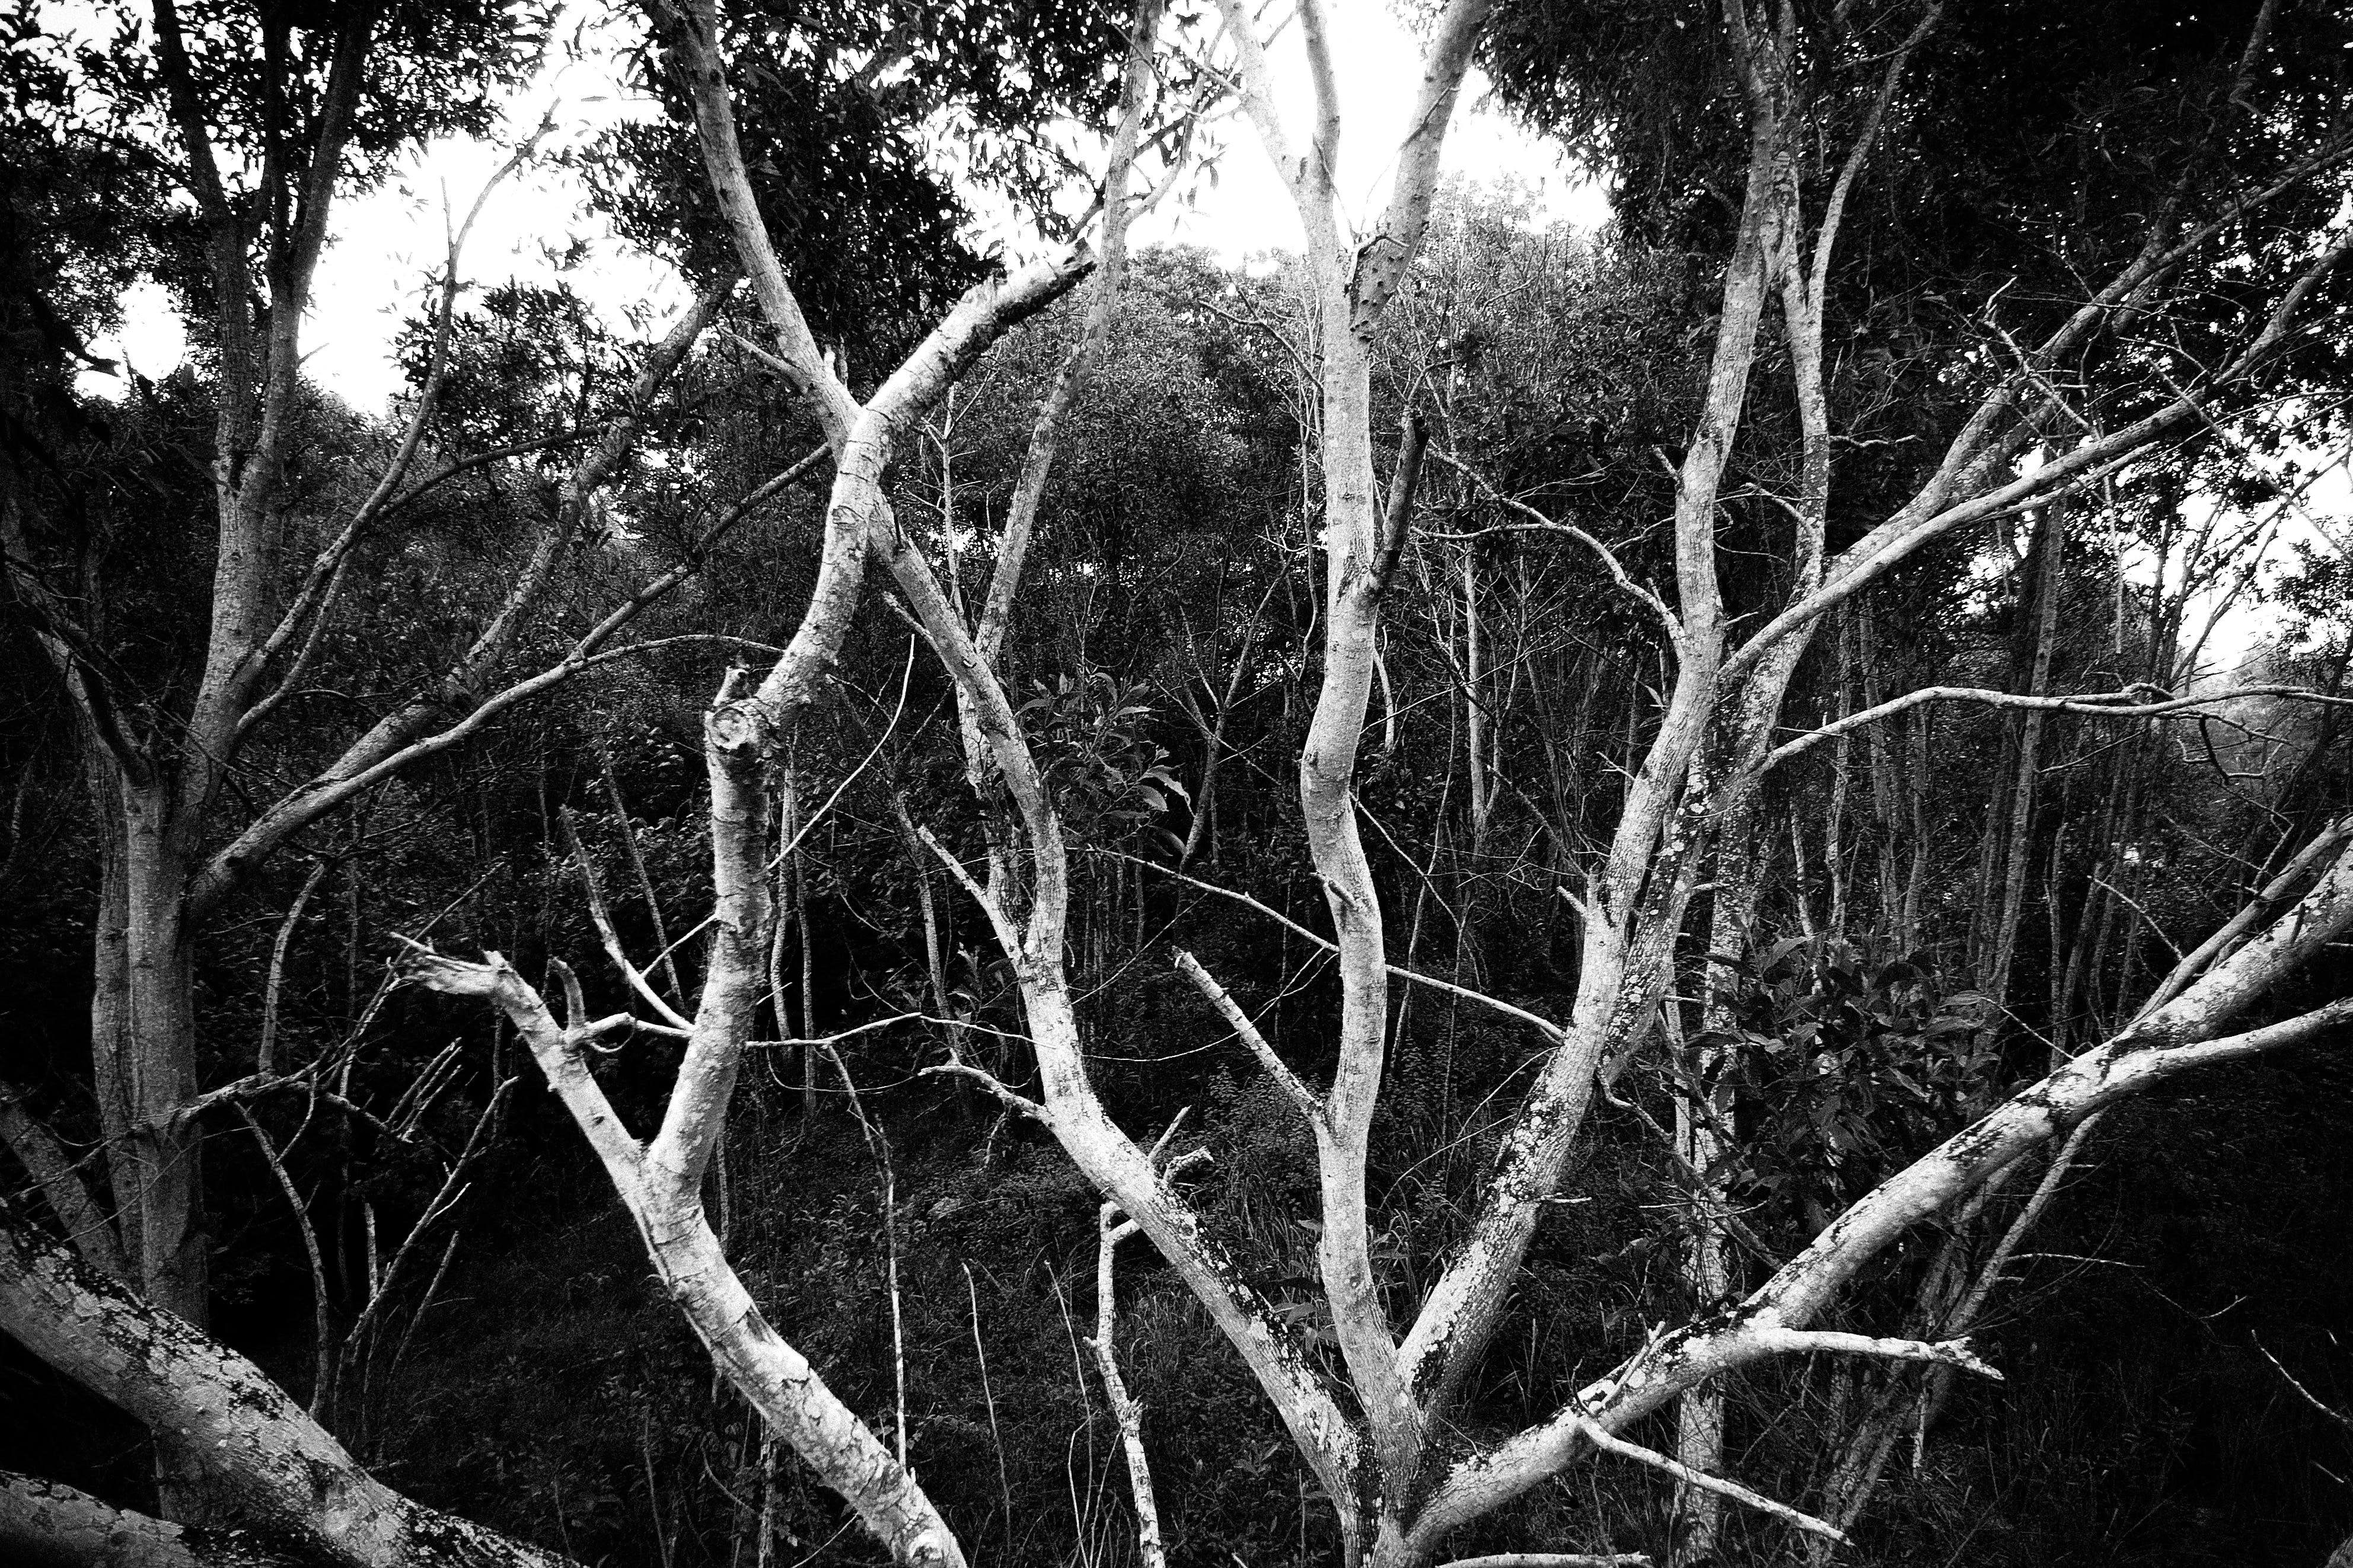 Kostenloses Stock Foto zu bäume, graustufen, hell, holz